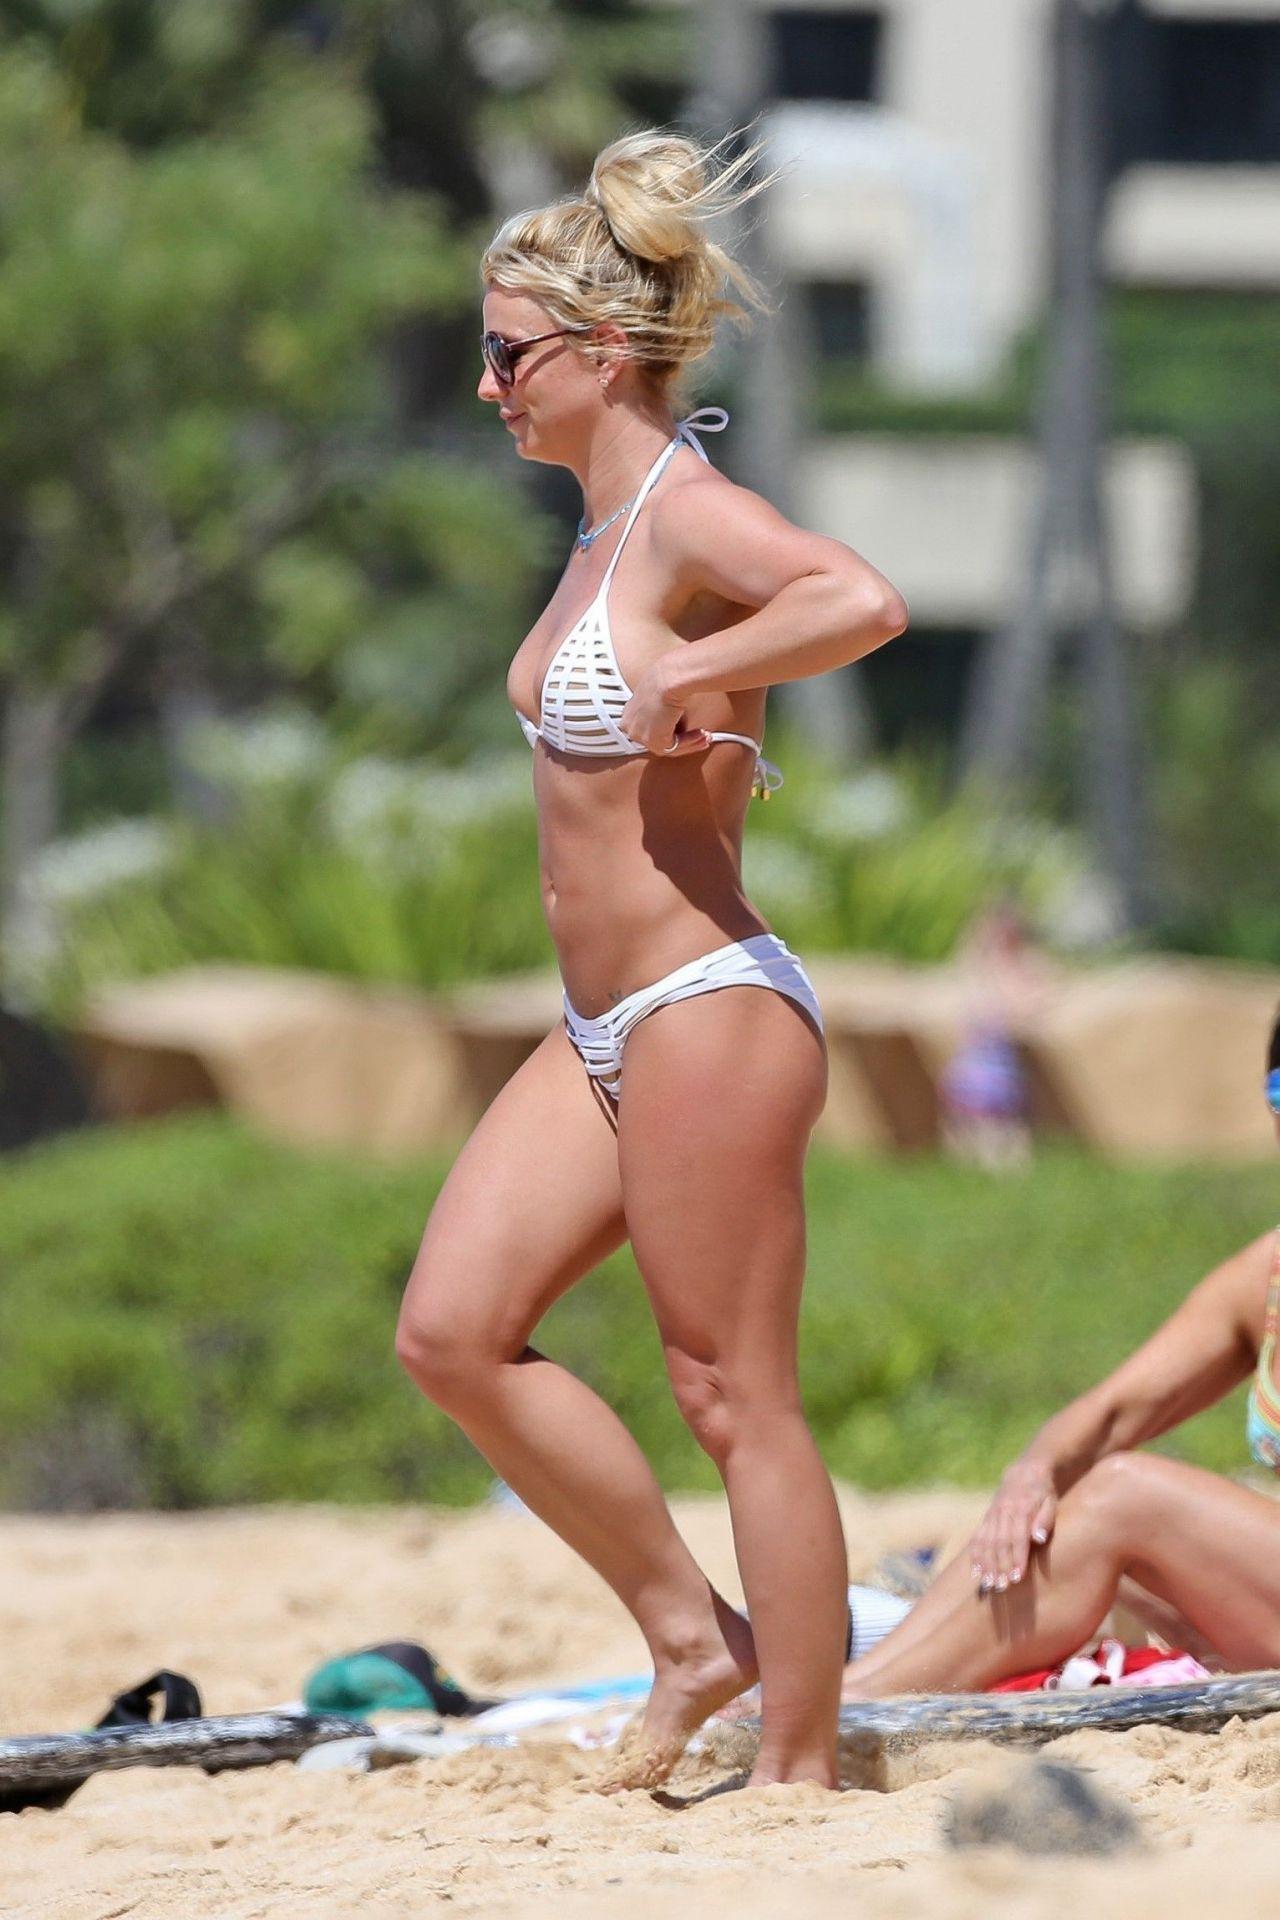 Britney spears pictures legs bikini